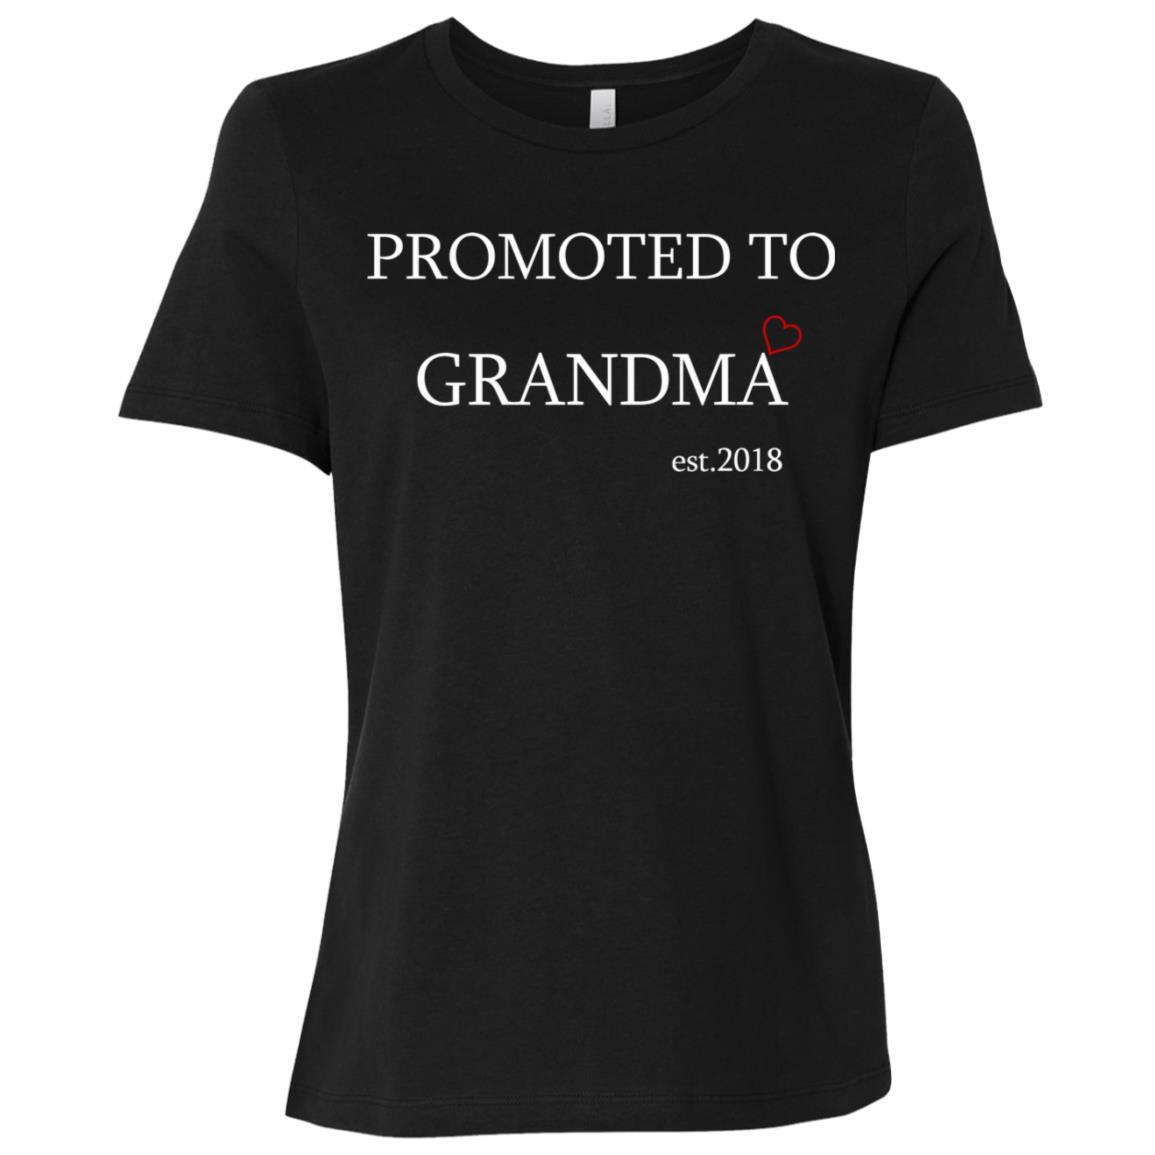 Promoted to grandma 2018 Women Short Sleeve T-Shirt